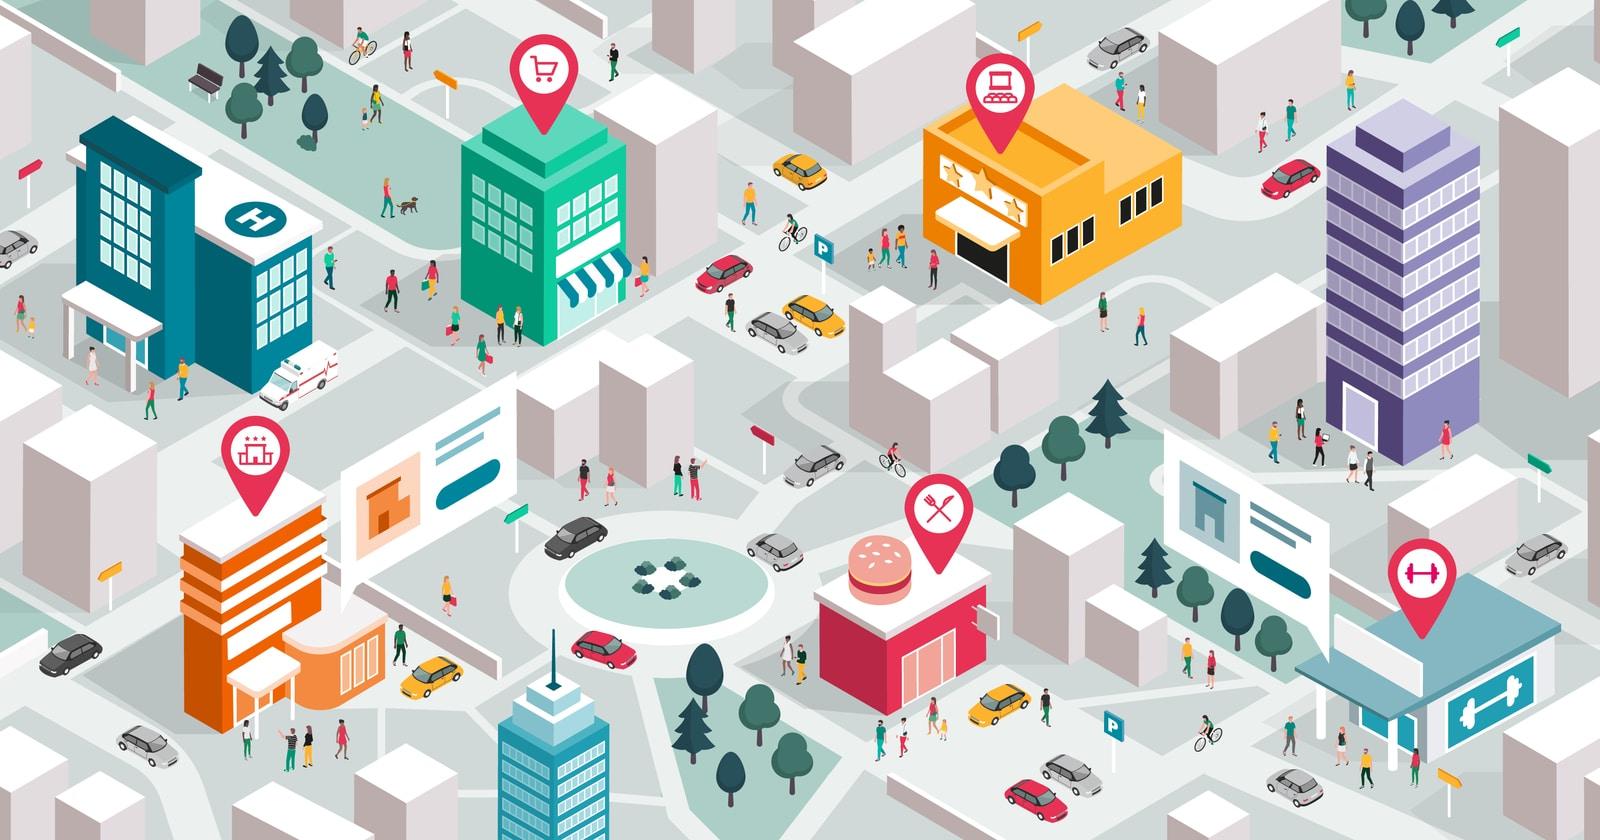 7 Ways to Improve Local SEO & Attract New Business via @sejournal, @HelenPollitt1